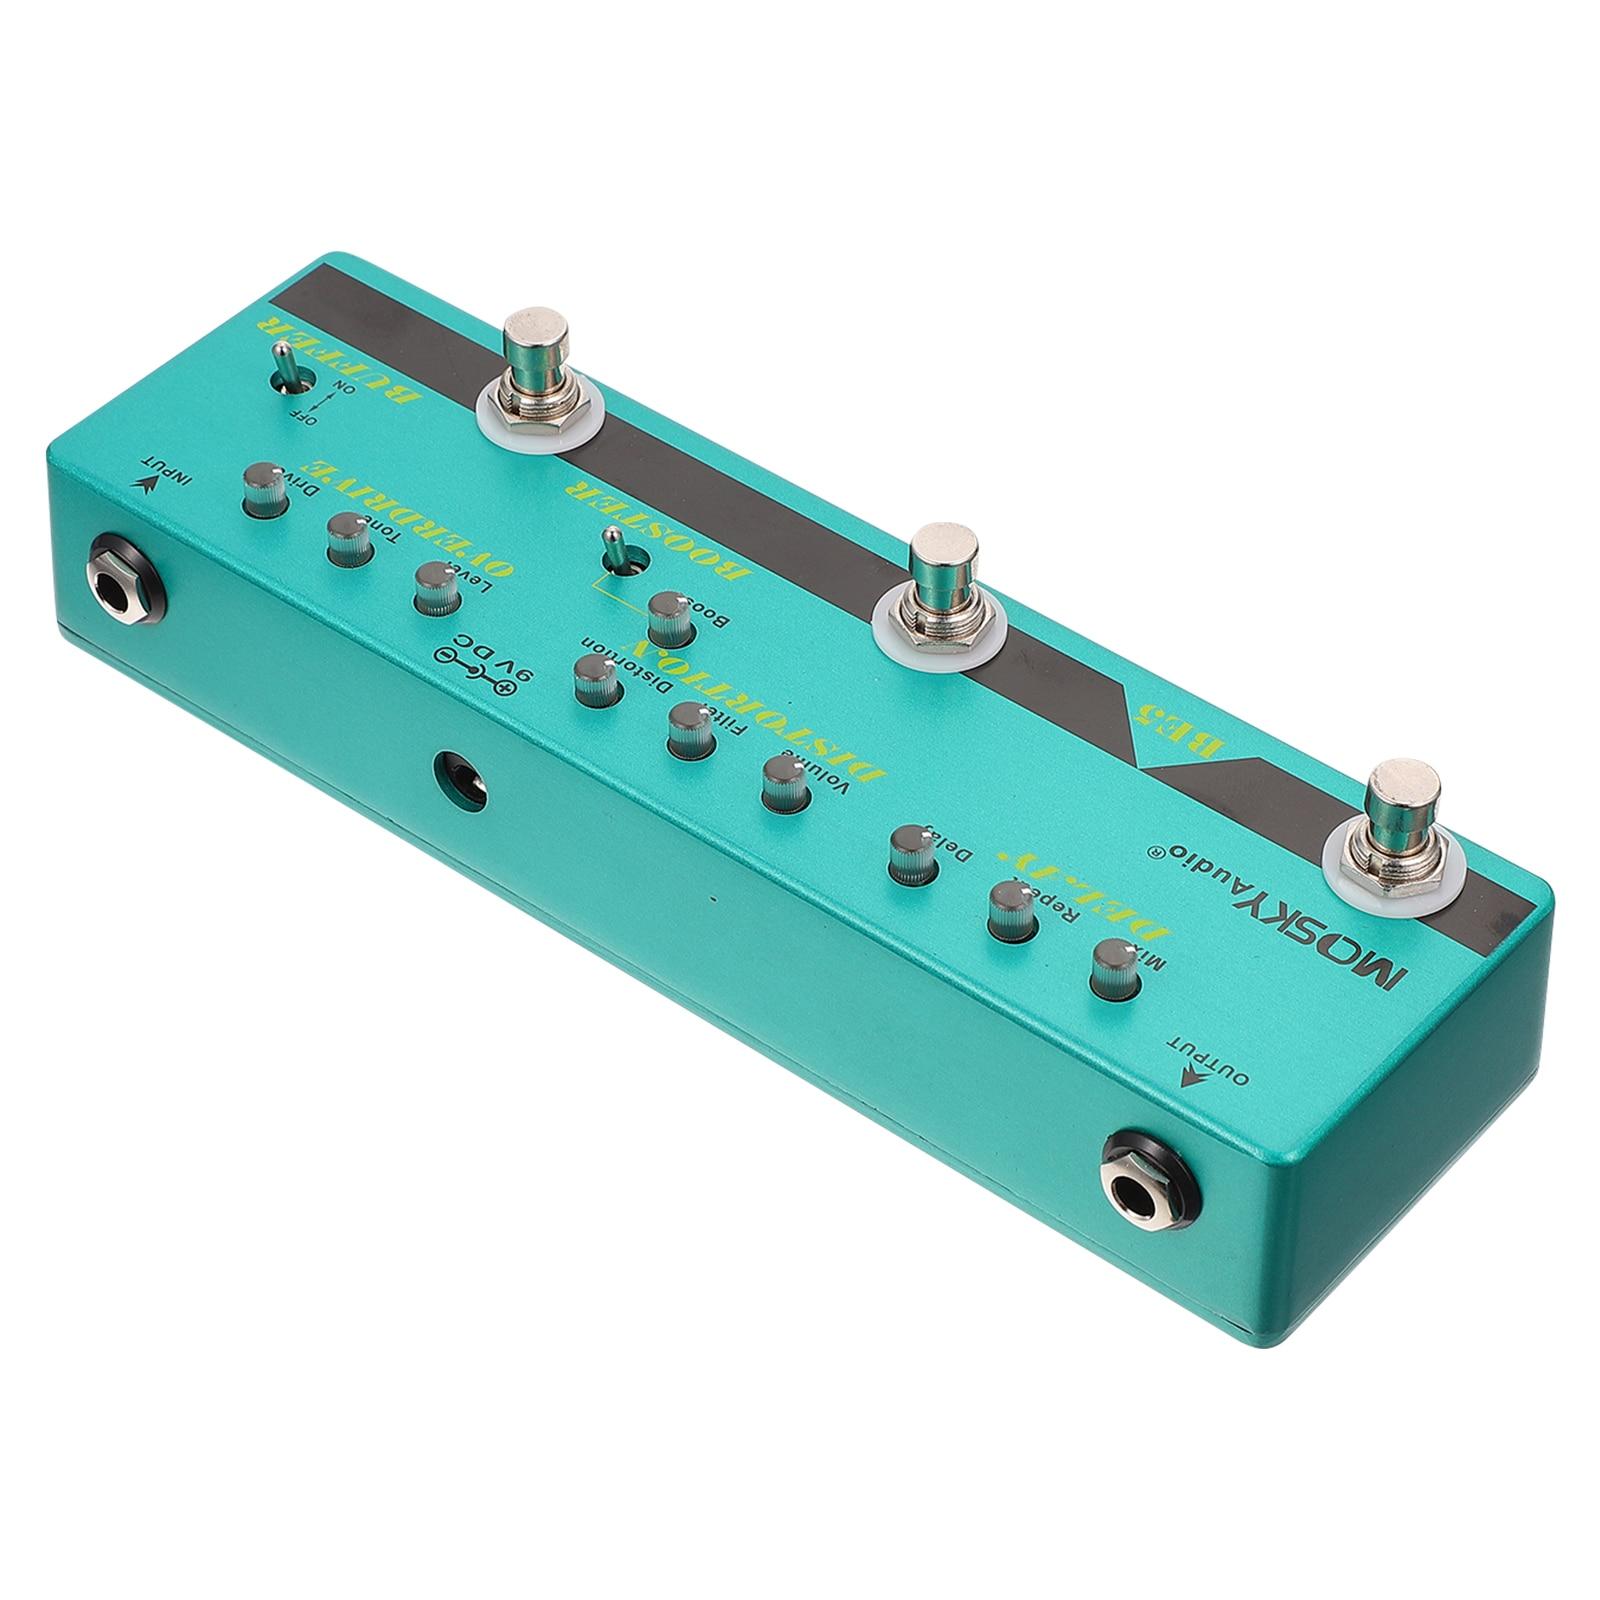 1pc Guitar Effector Guitar All-in-one Effector Mini Guitar Effect Processor (Sky-blue)